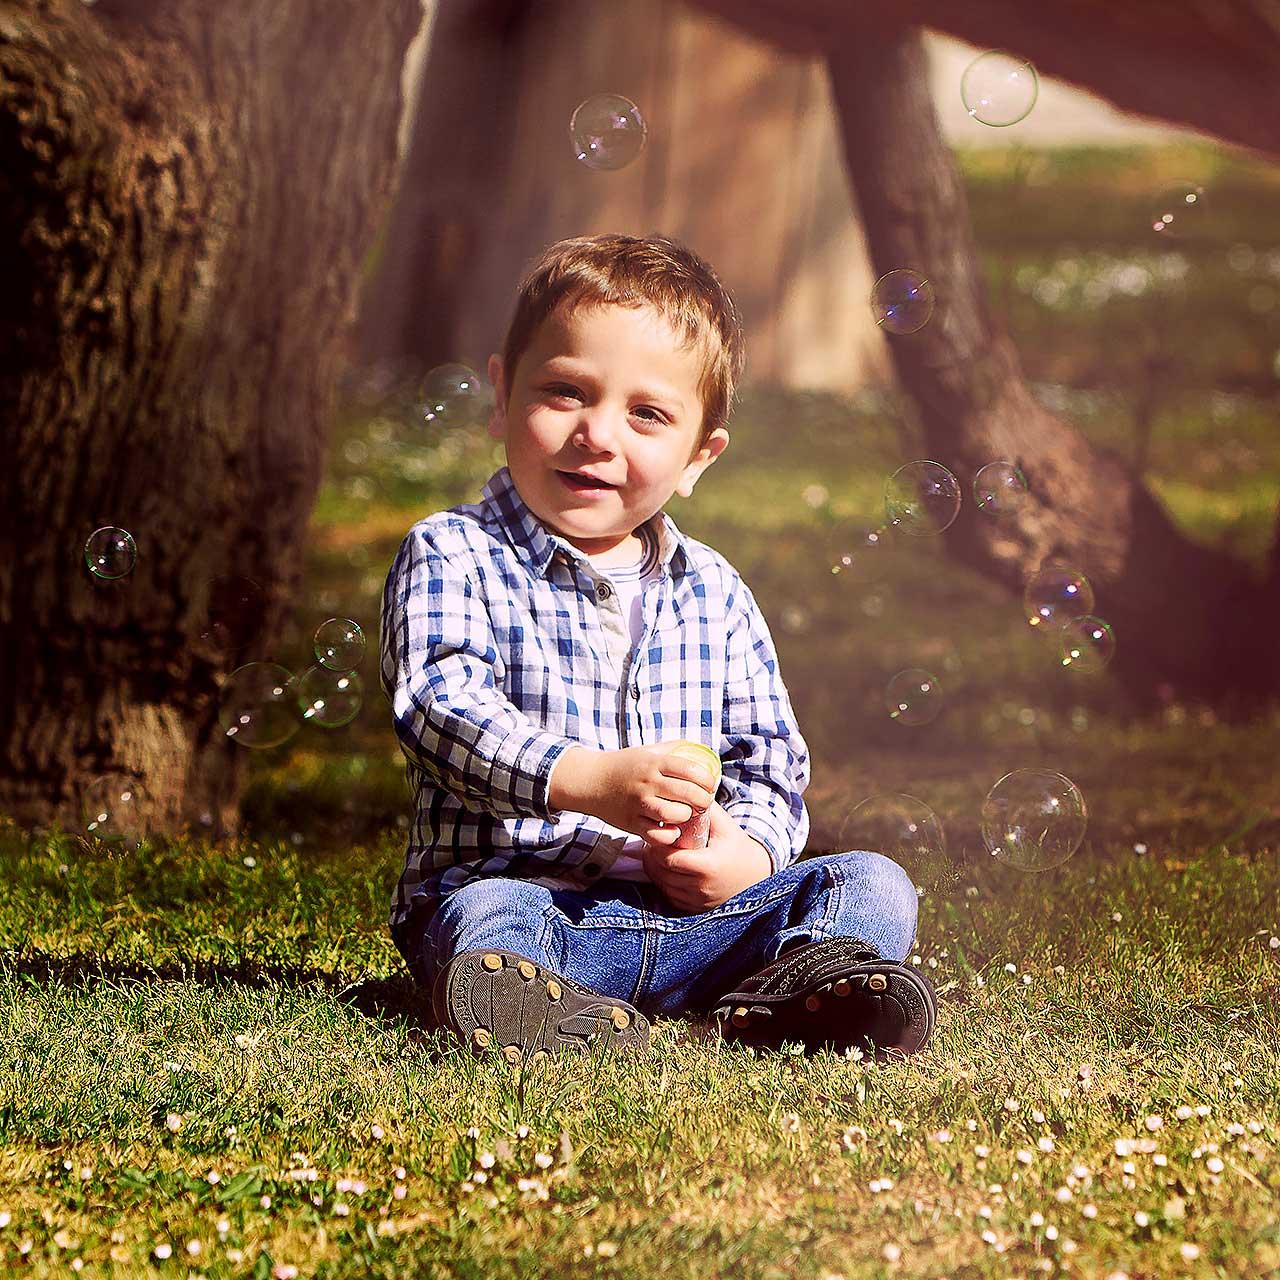 https://www.kidsphotography.es/wp-content/uploads/2021/04/Fotografia-Infantil-Zaragoza-Mateo-0087-©-Kids-Photography.jpg